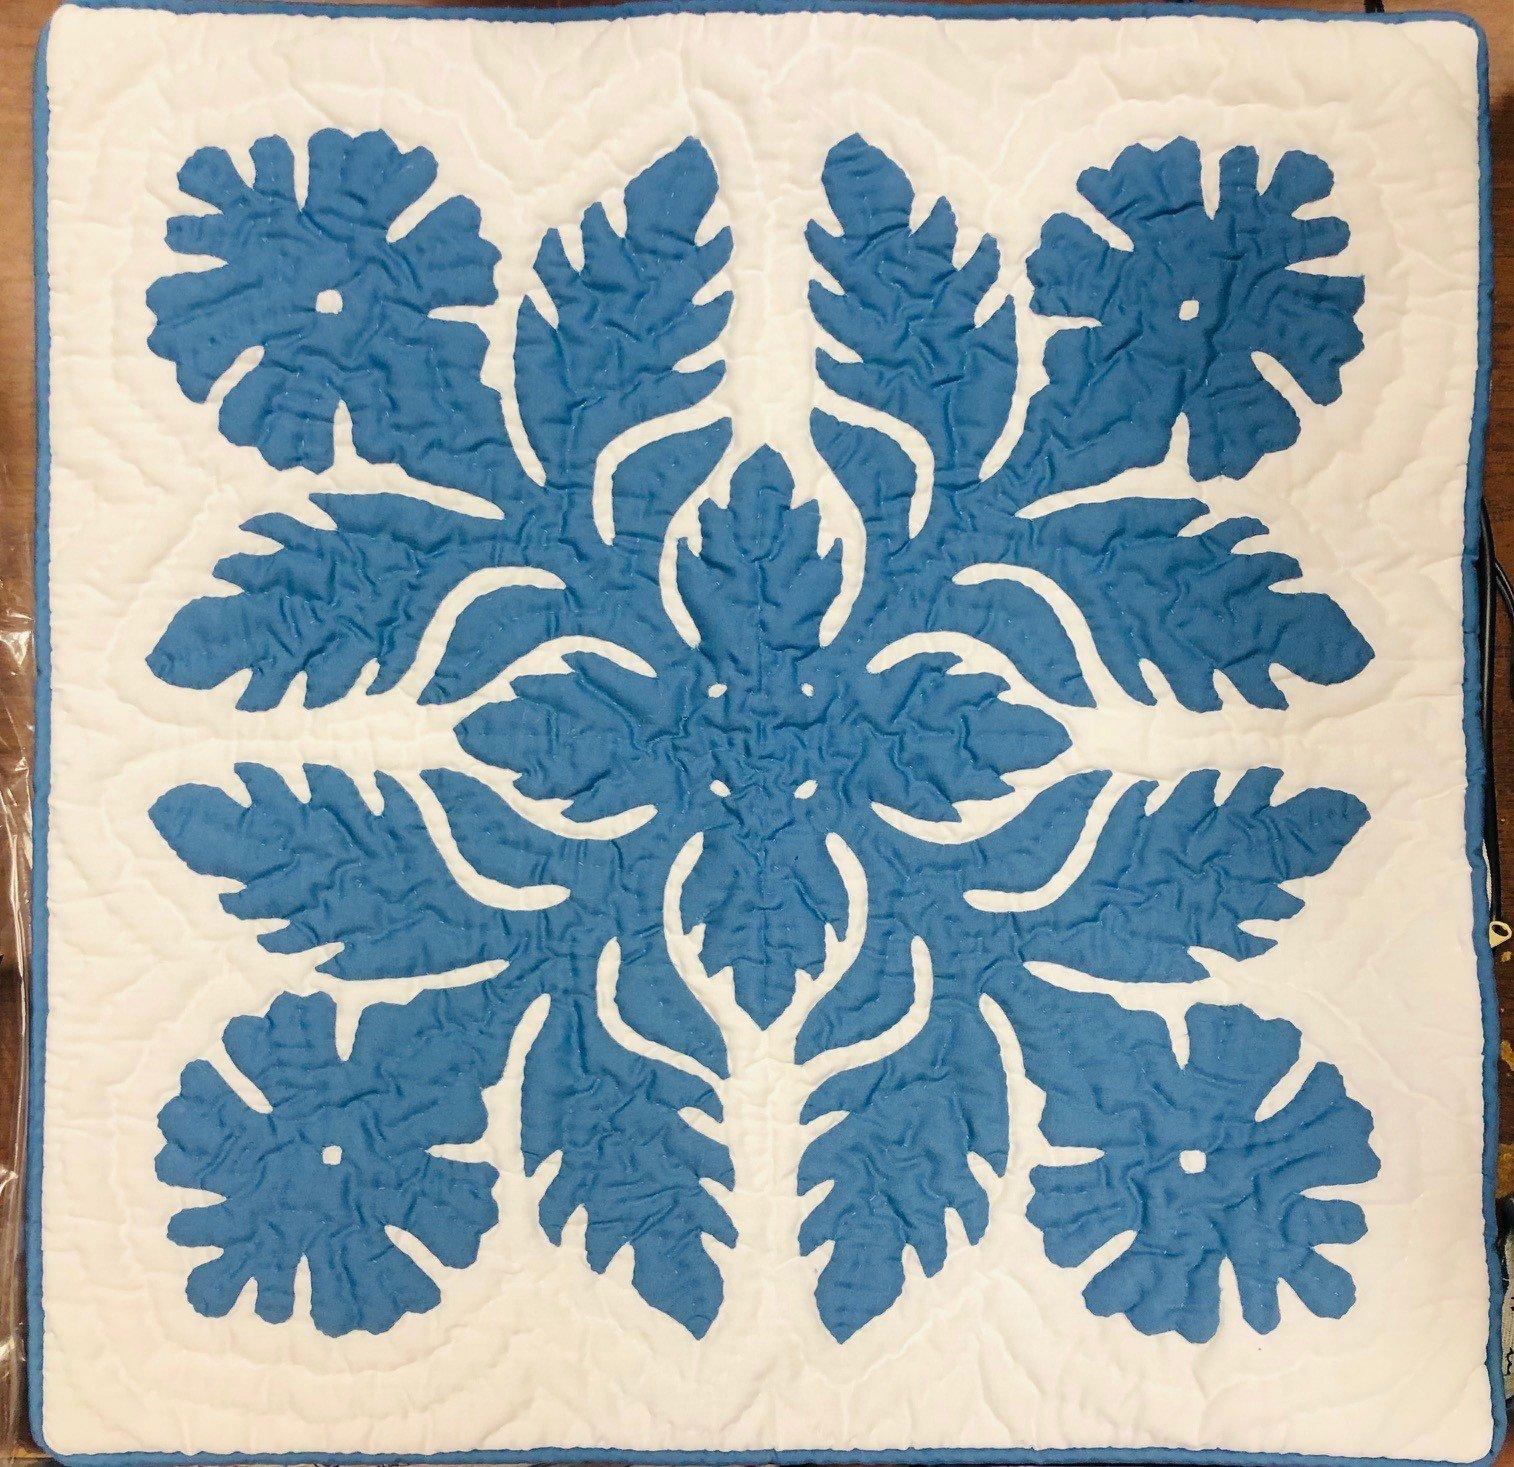 18 X 18 Hawaiian quilt Pillow Covers Hibiscus blue